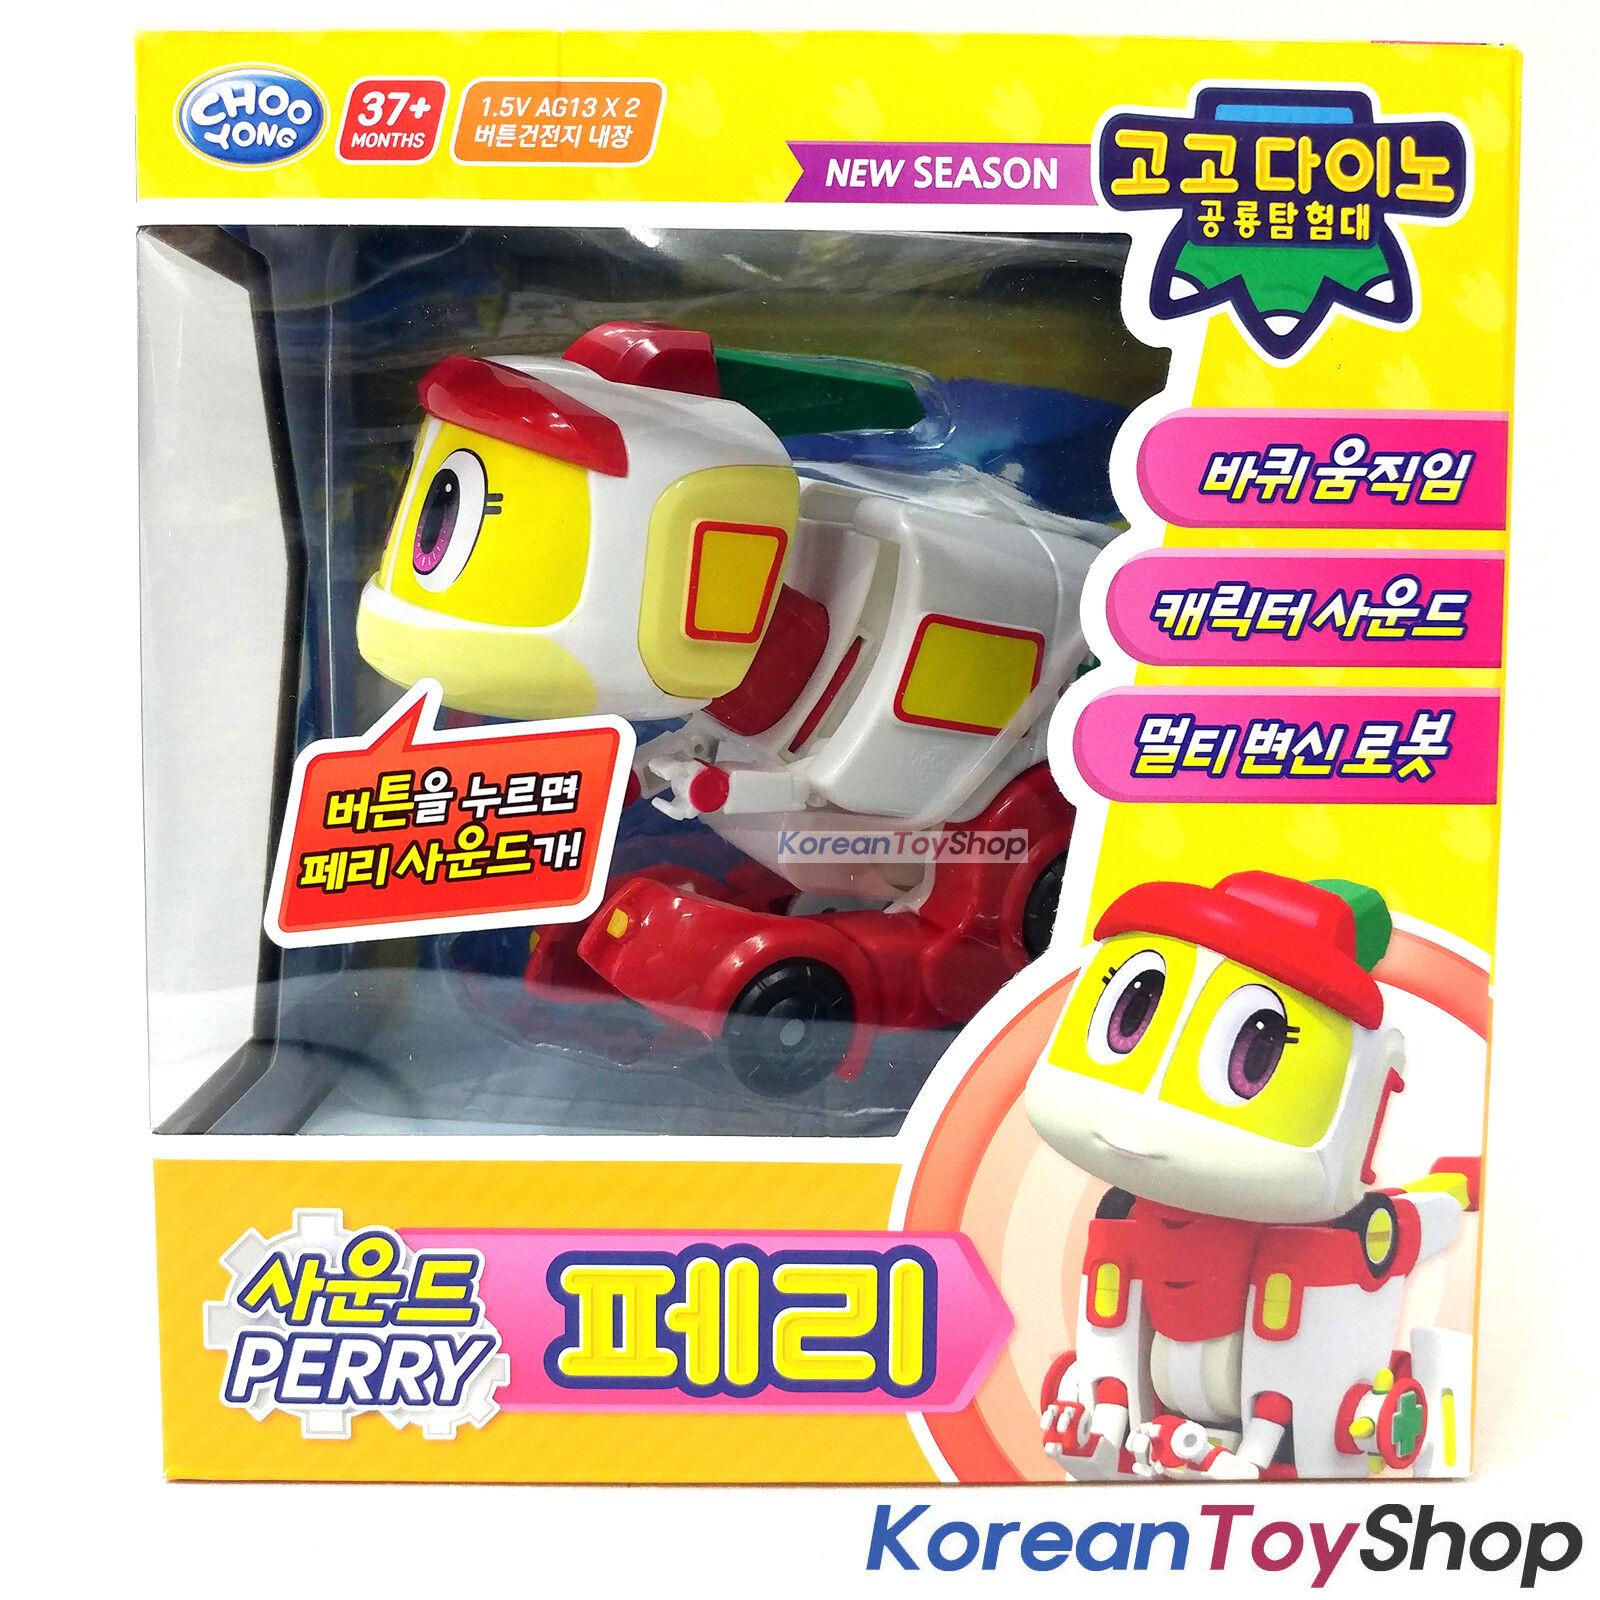 Gogo Dino PERRY Transformer Sound Sound Sound DX Robot Dinosaur Toy Car Ambulance Original d4271f